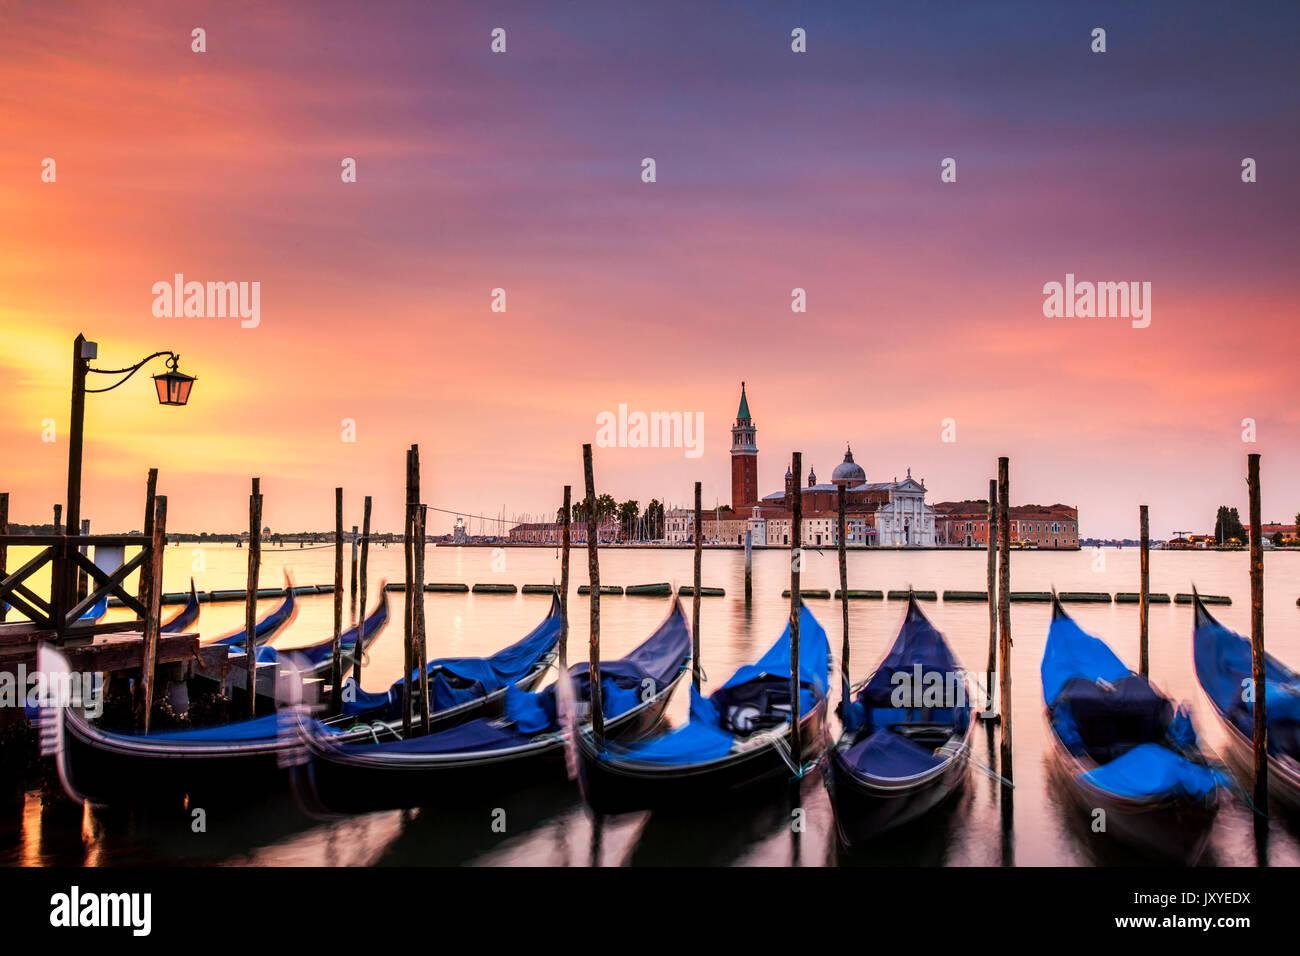 Vibrant dawn over the island of San Giorgio Maggiore seen from just off St. Mark's Square in Venice, Italy. - Stock Image